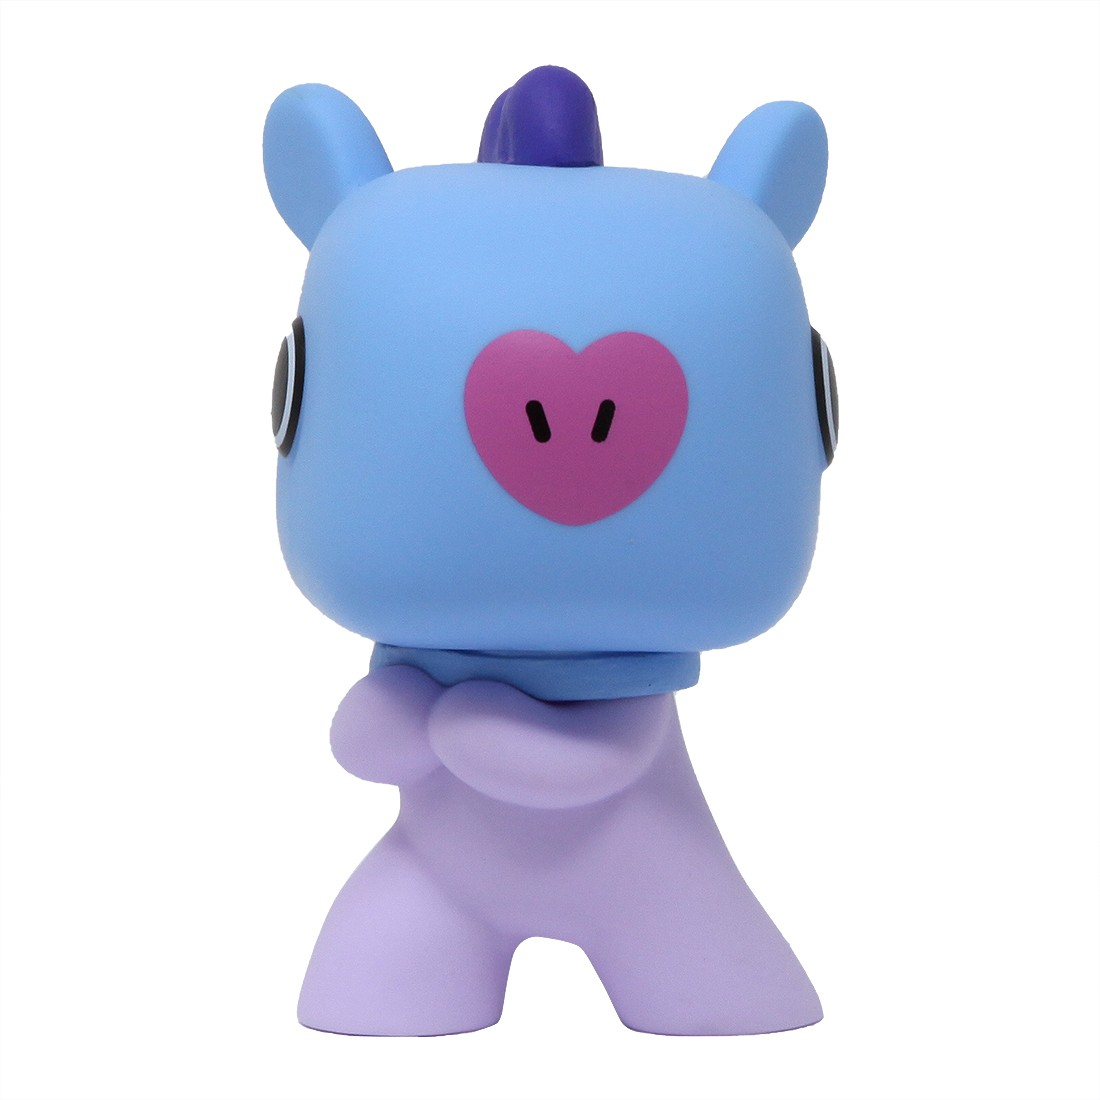 Funko POP Animations BT21 Mang (blue)